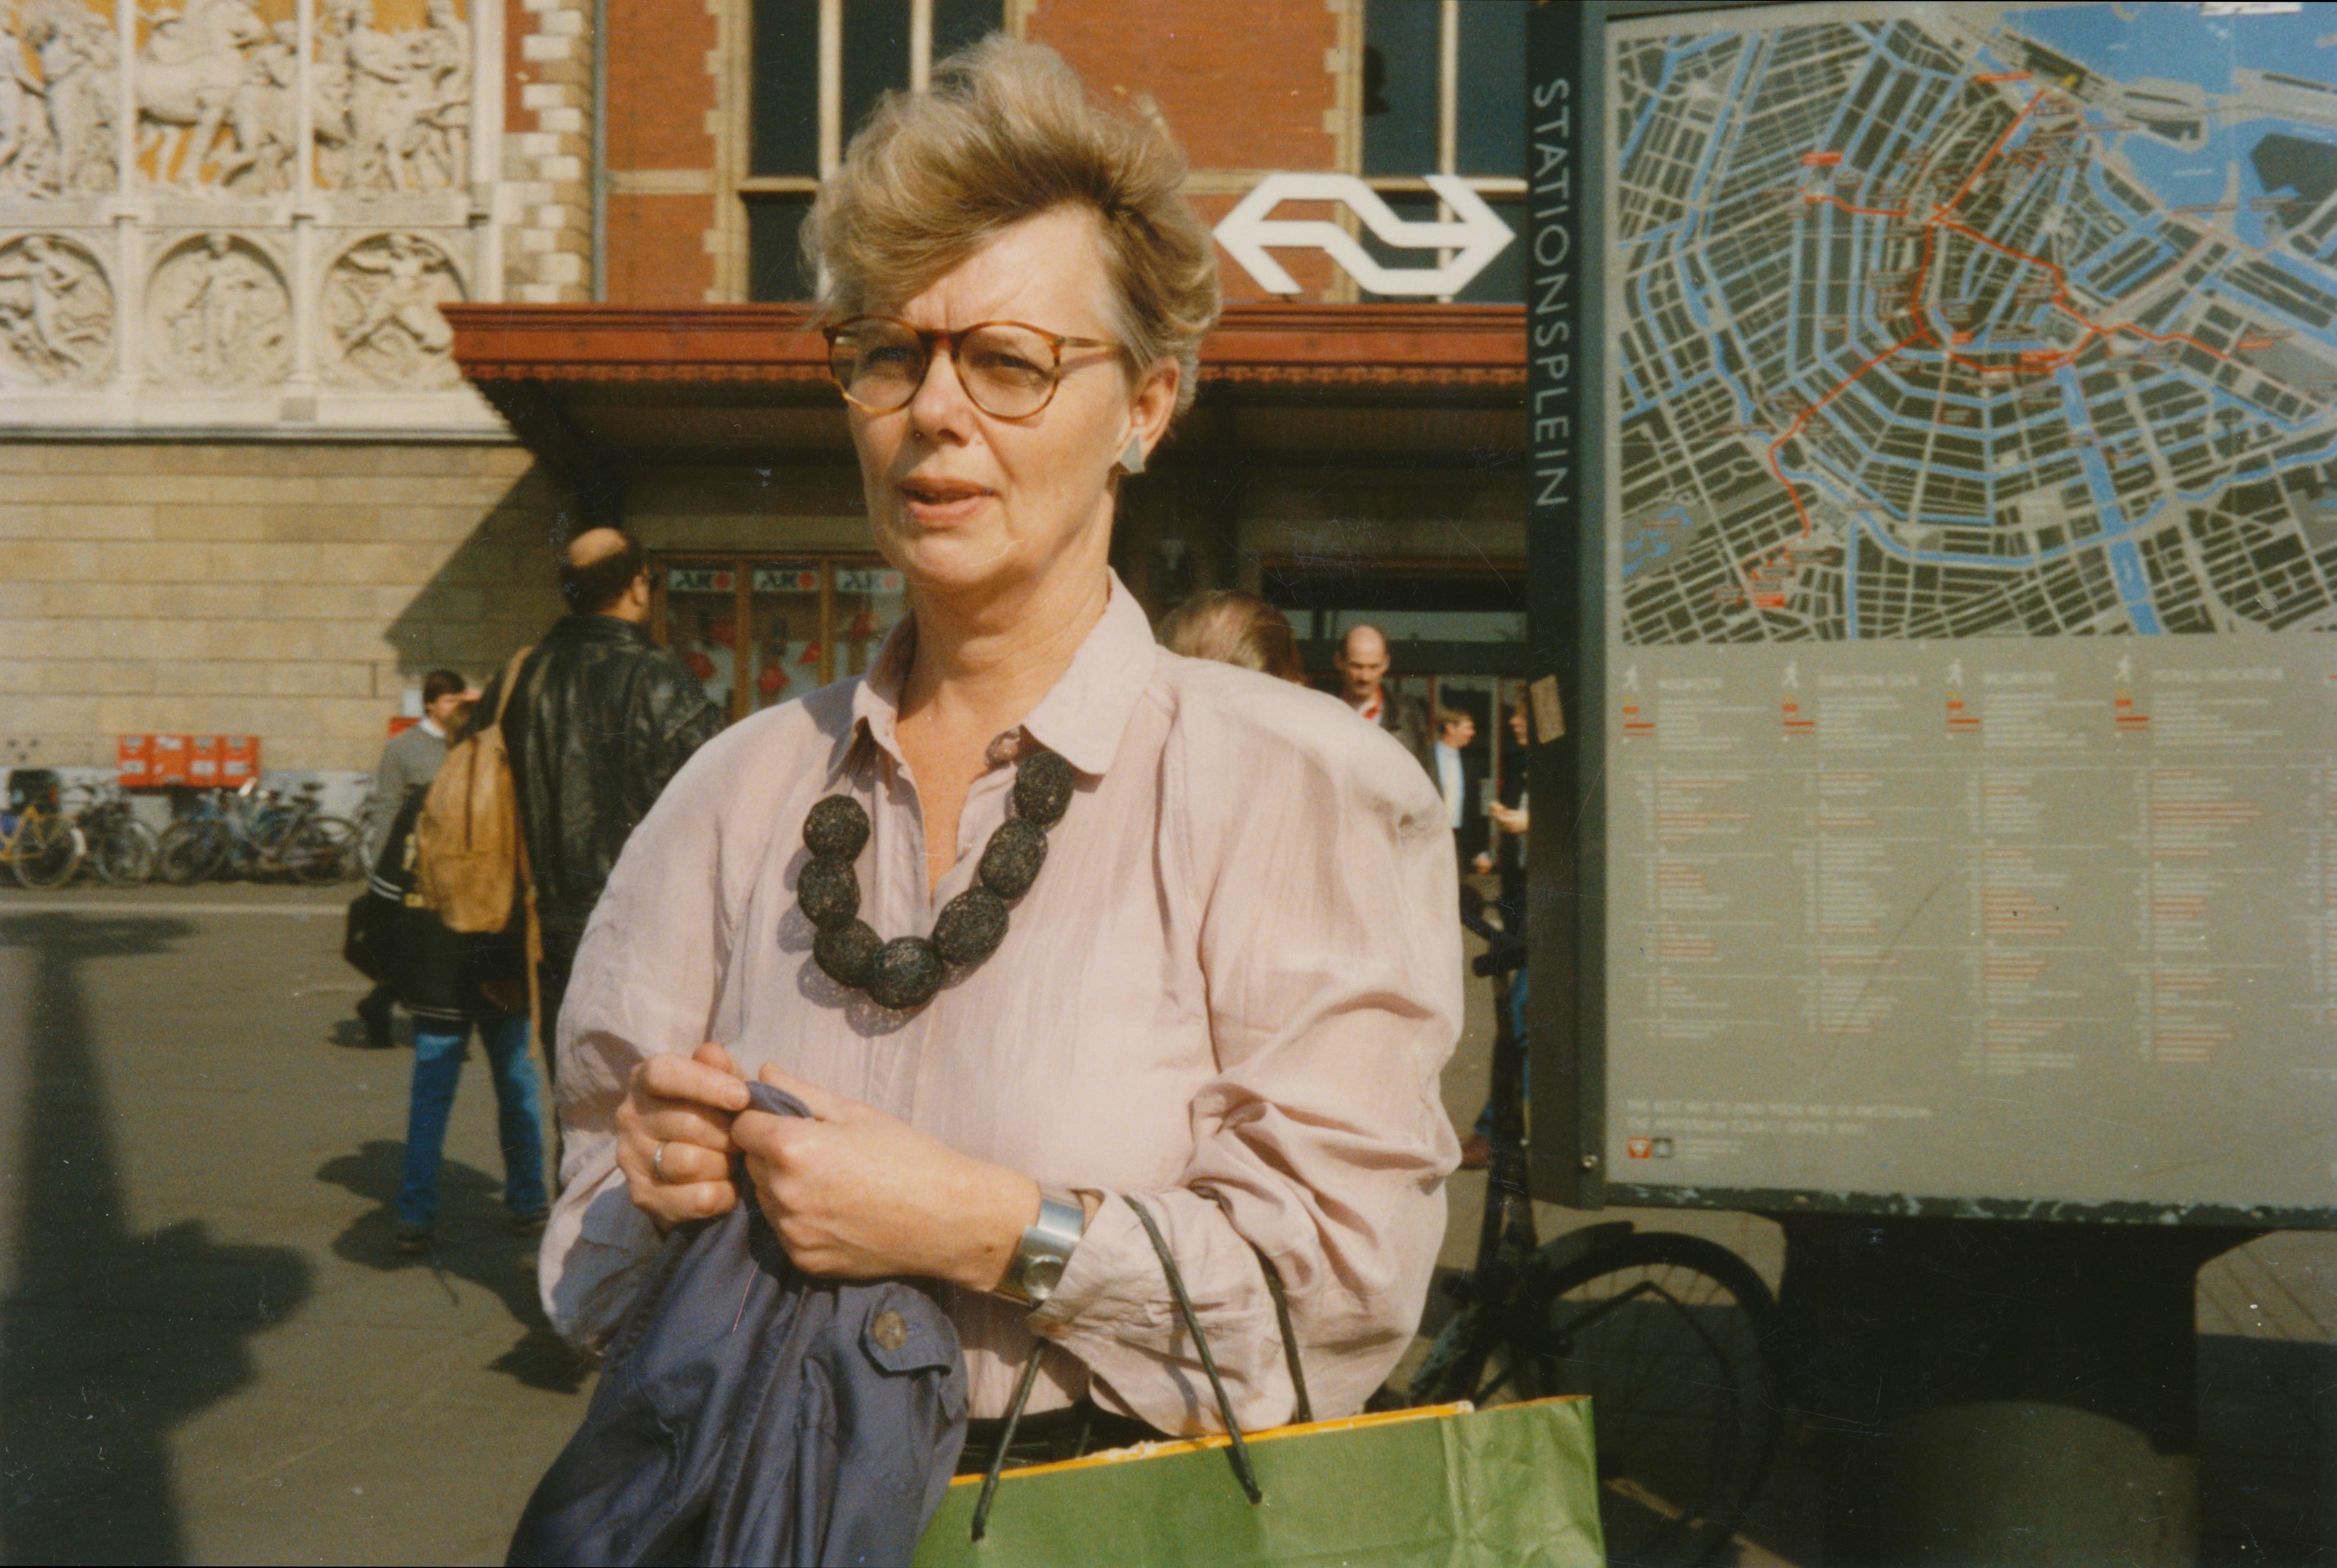 Claartje Keur, Zelfportret met halssieraad van Peggy Bannenberg, Amsterdam, Stationsplein, maart 1993. Foto Claartje Keur